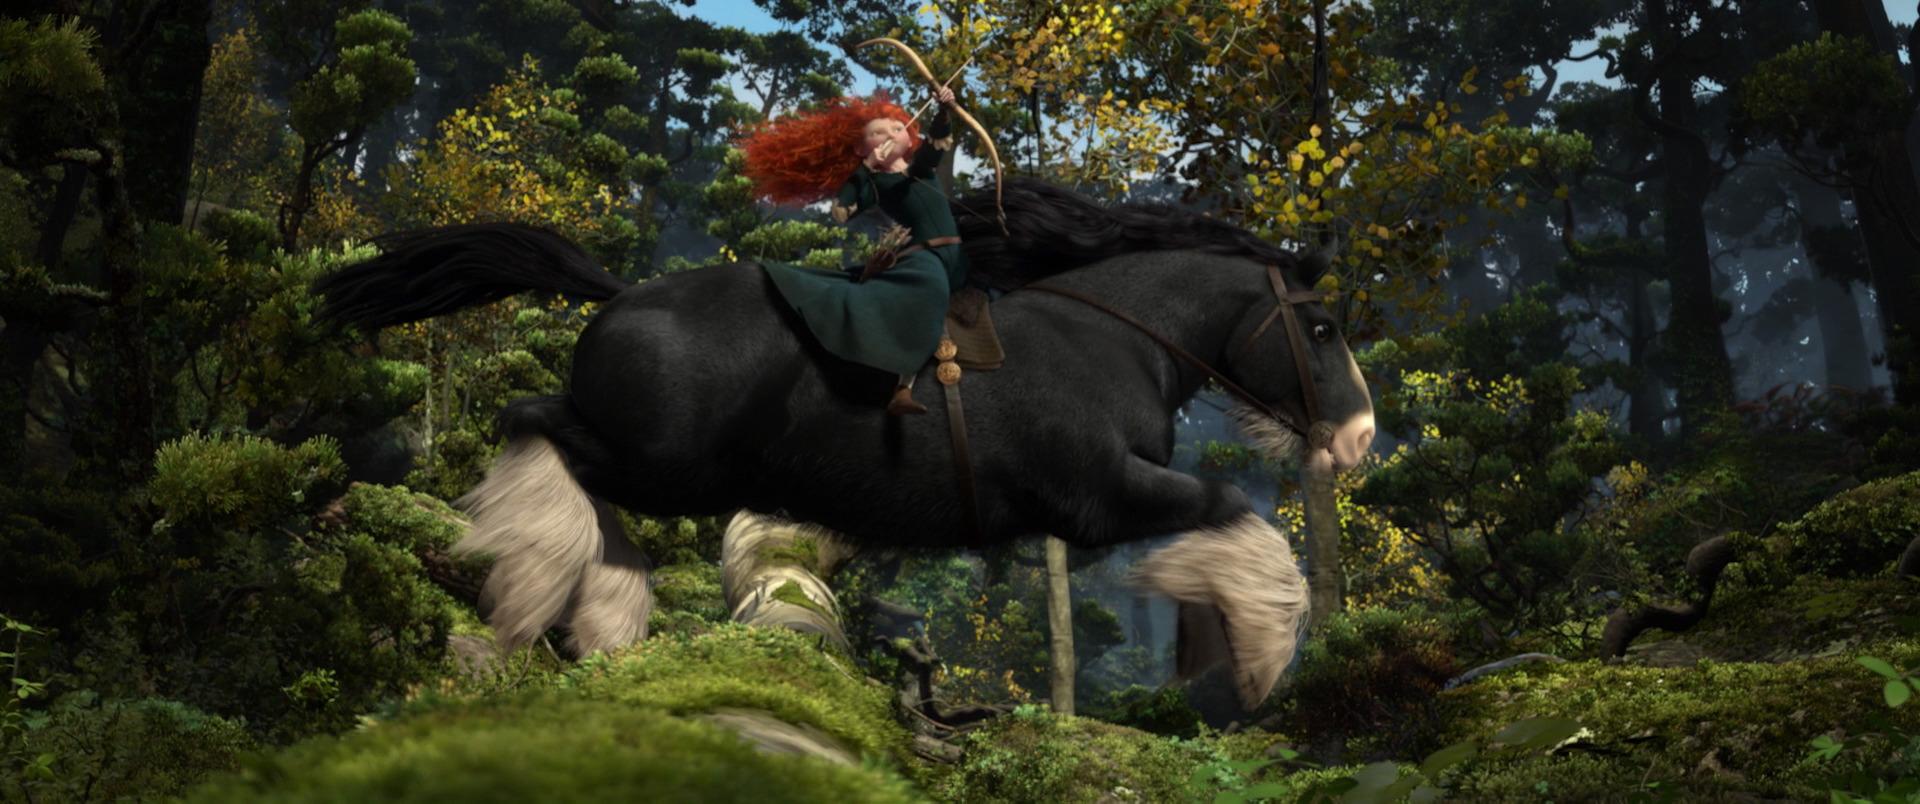 Image result for Merida on horseback shooting arrows